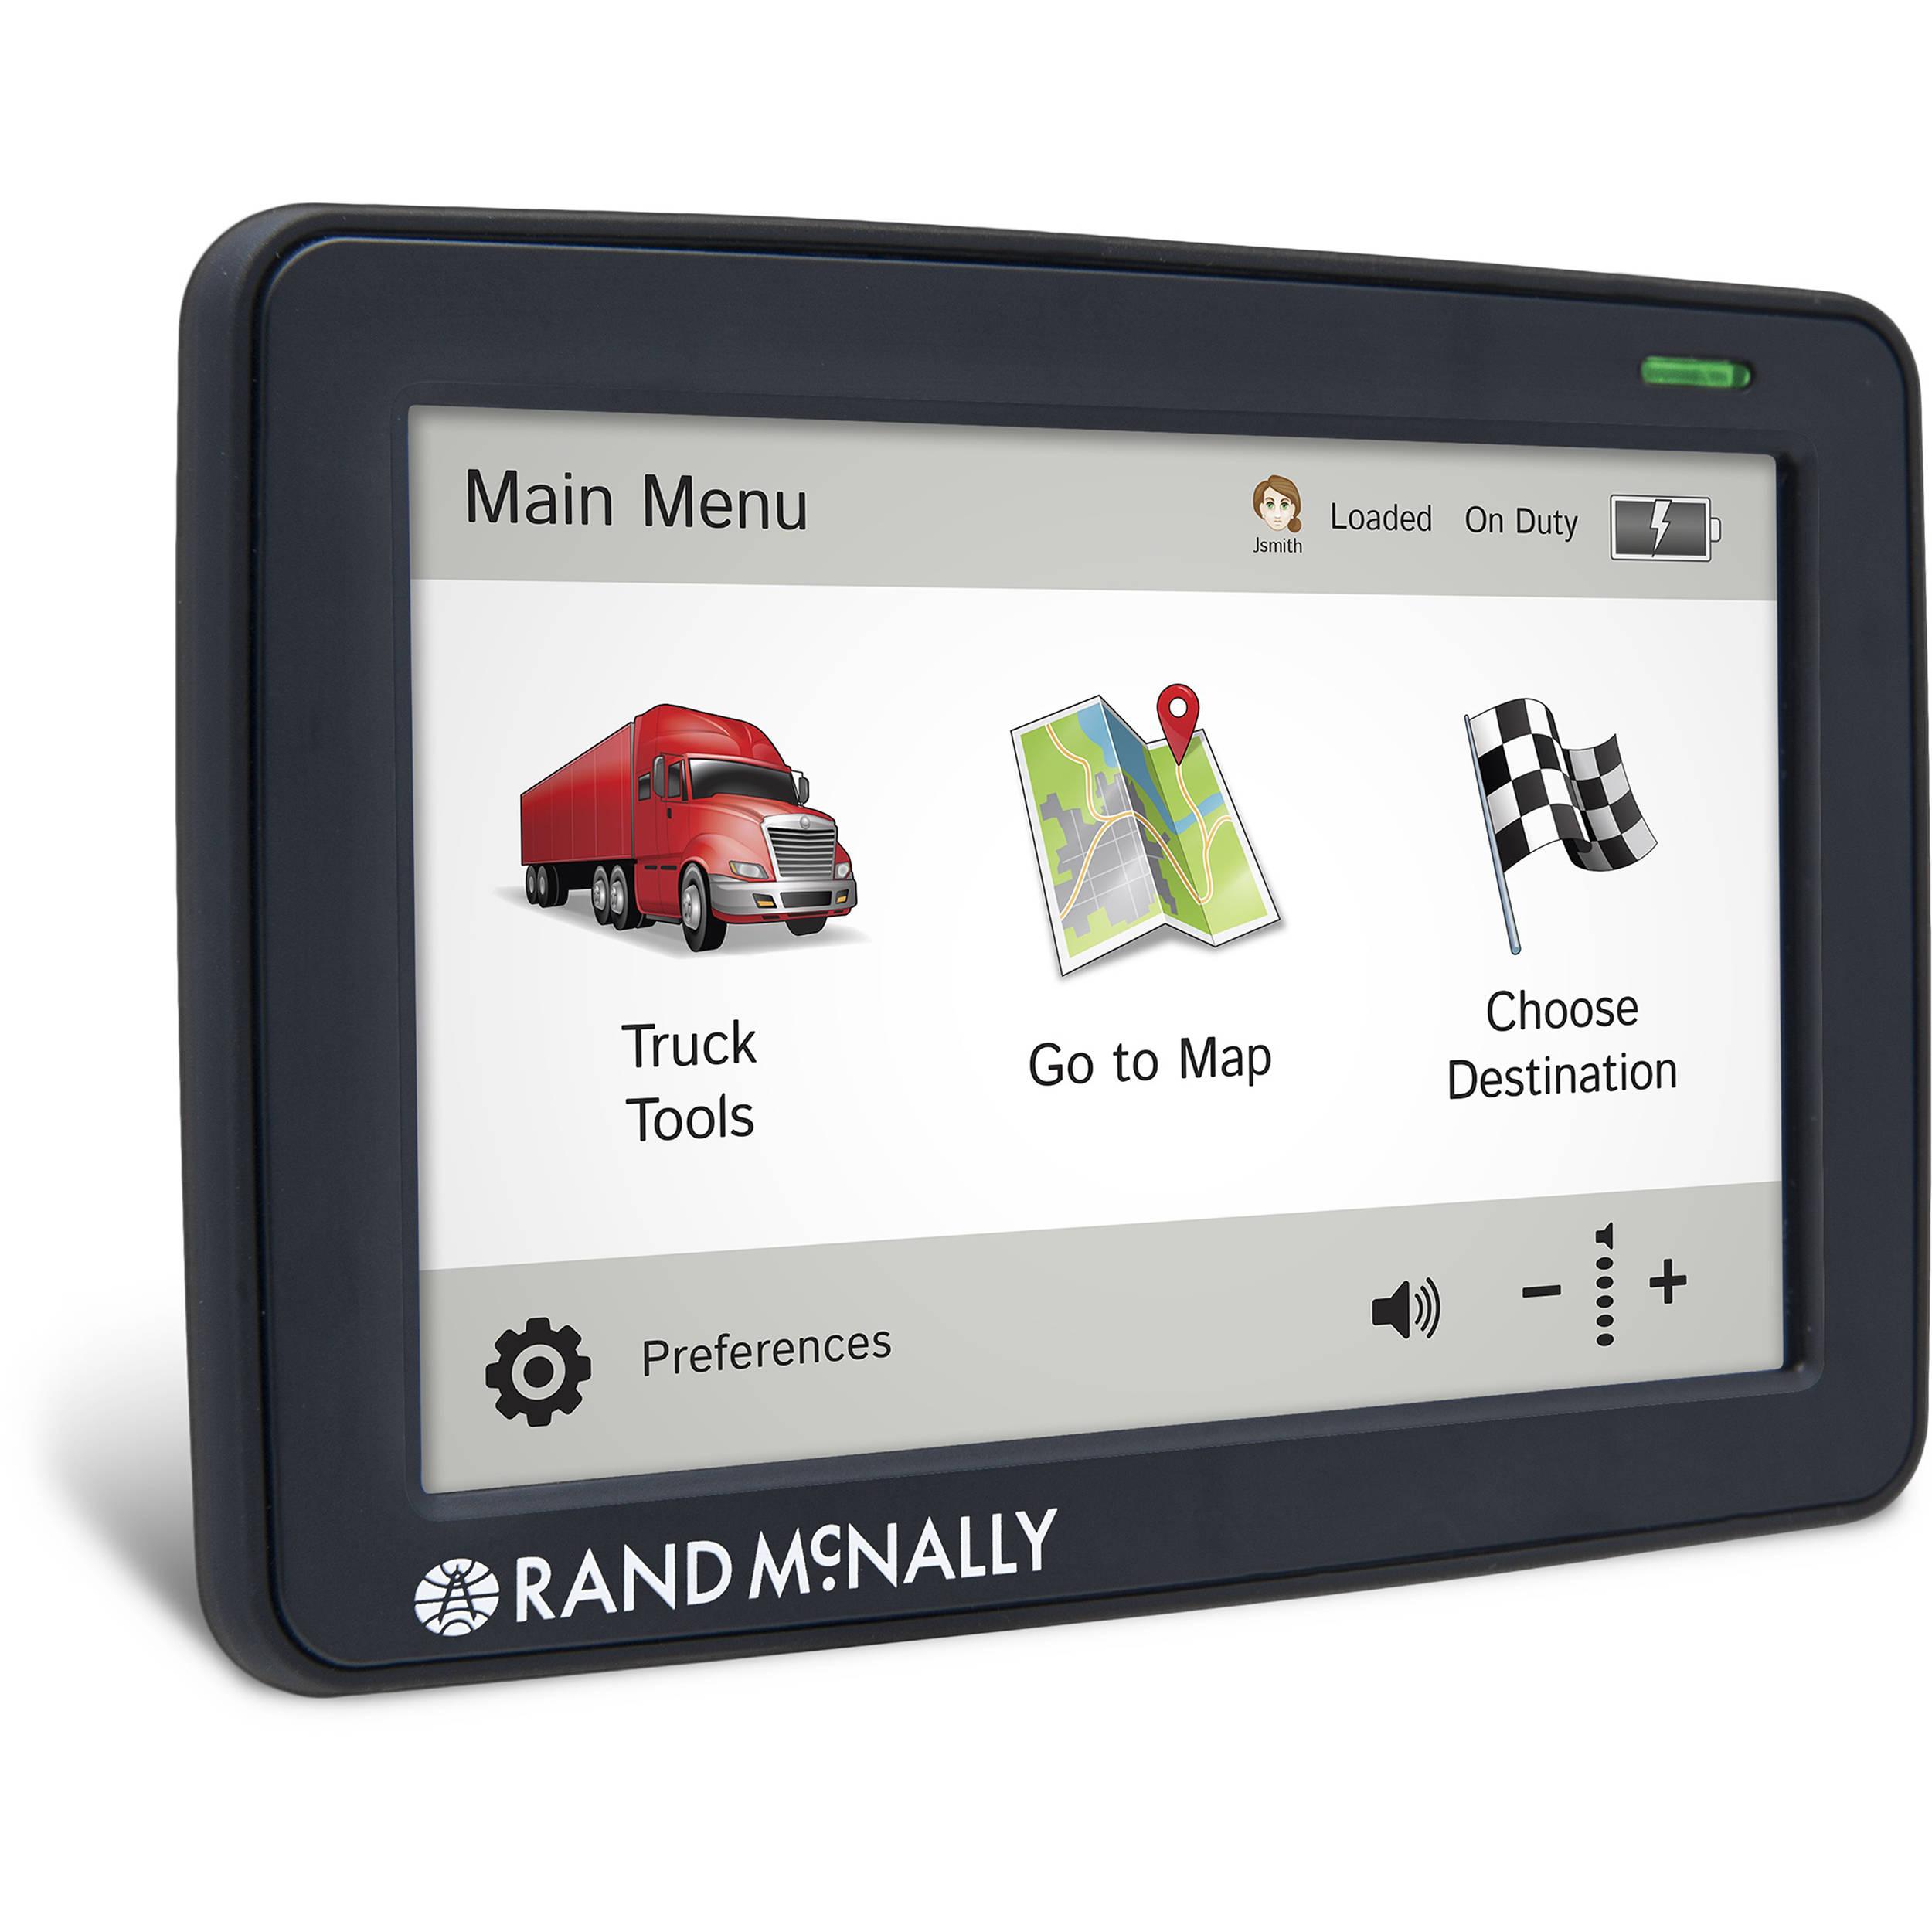 Rand Mcnally Gps >> Rand McNally IntelliRoute TND 530 LM GPS Device 528011707 B&H